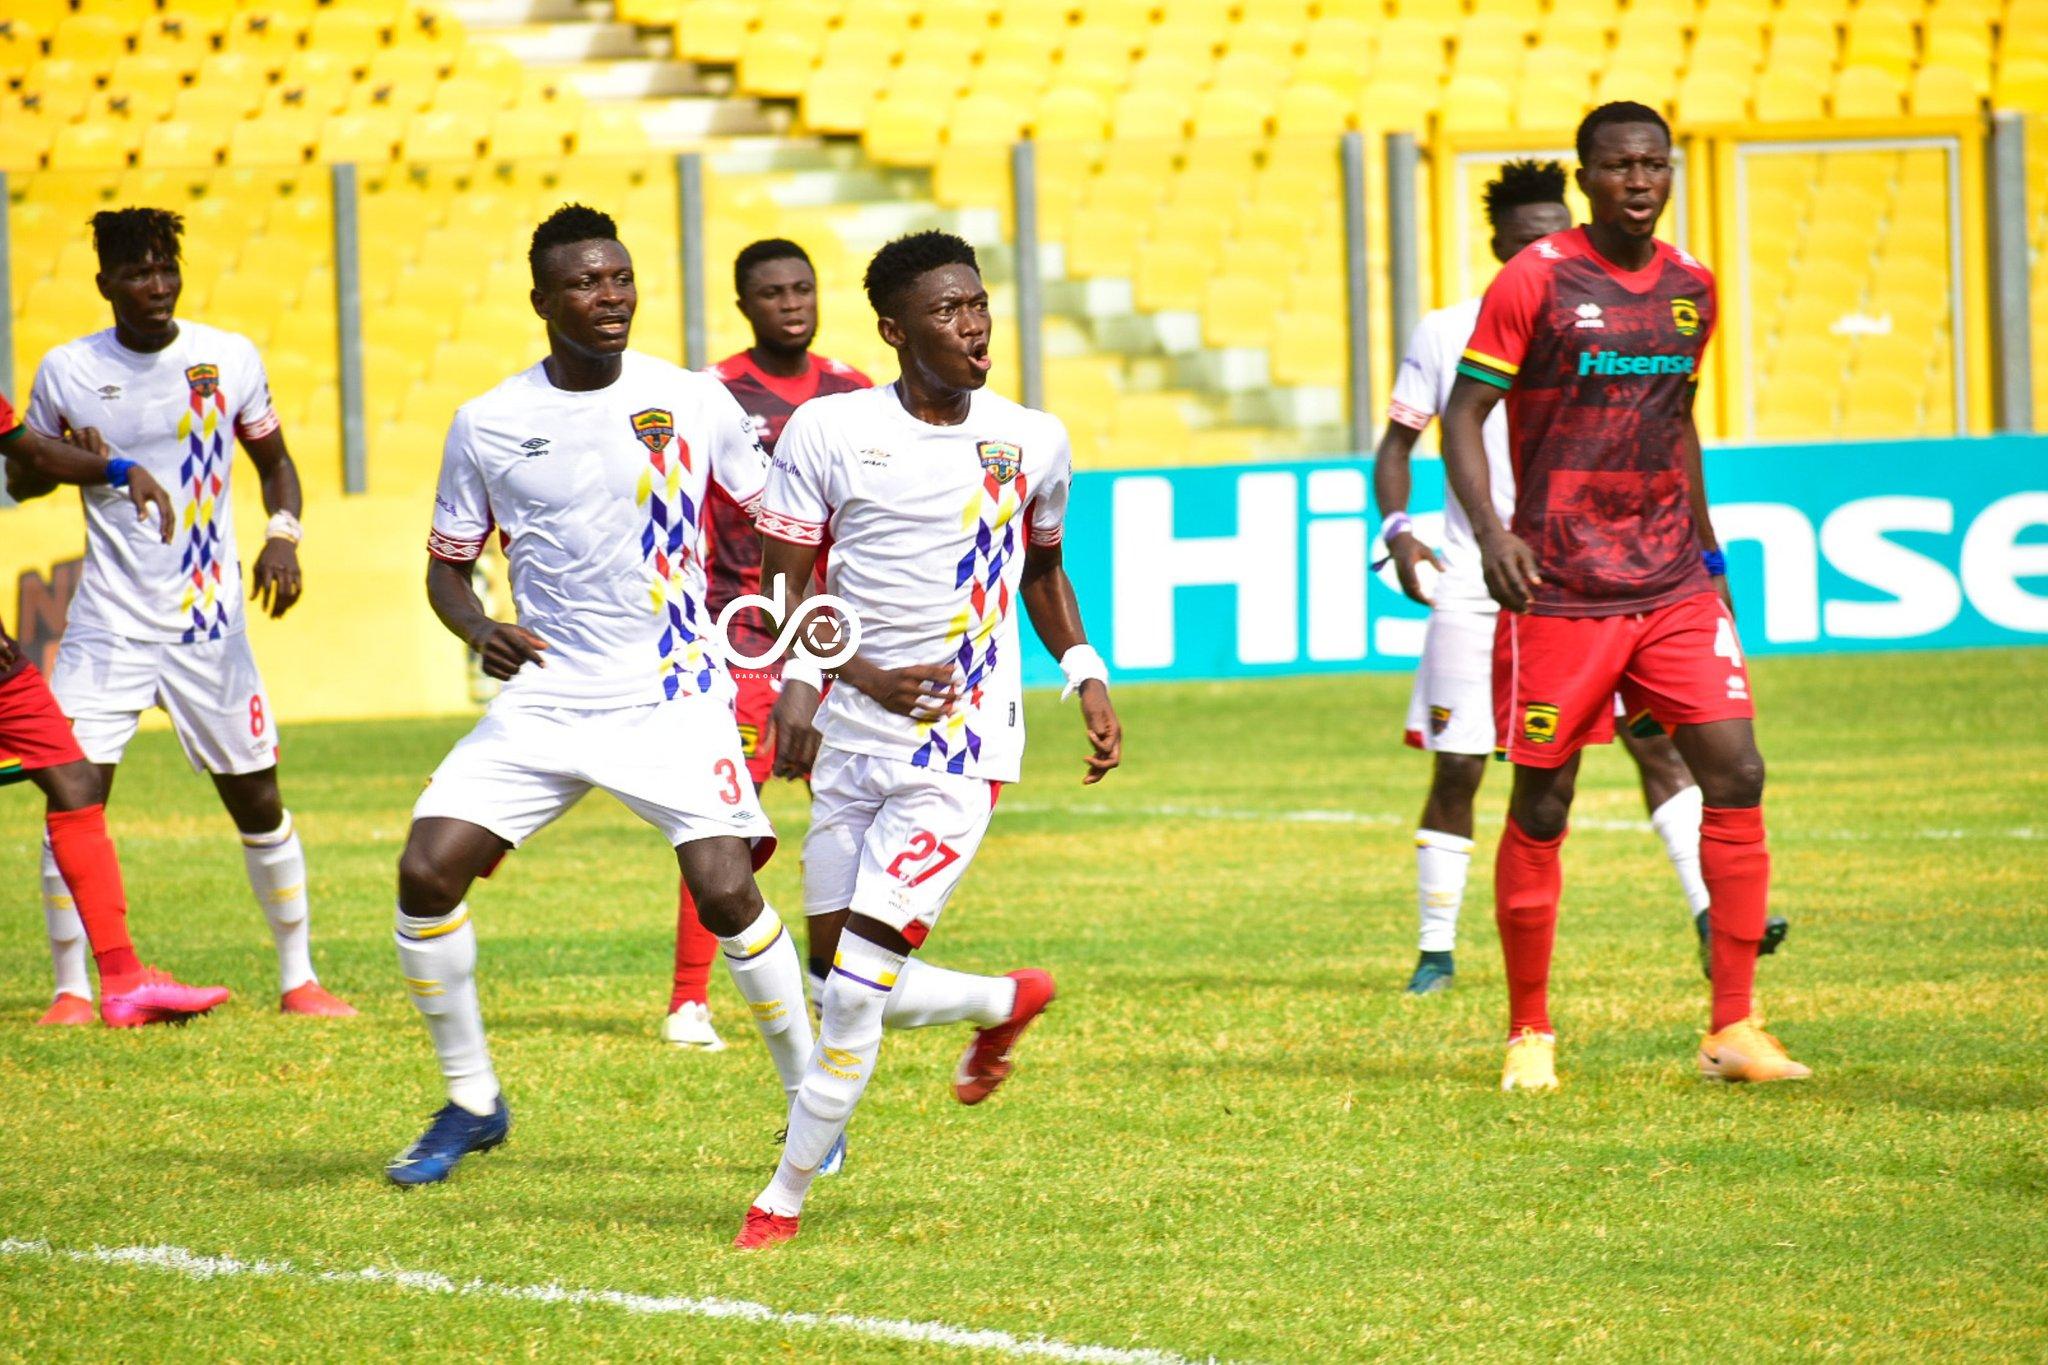 LIVE UPDATES: Asante Kotoko vs Hearts of Oak